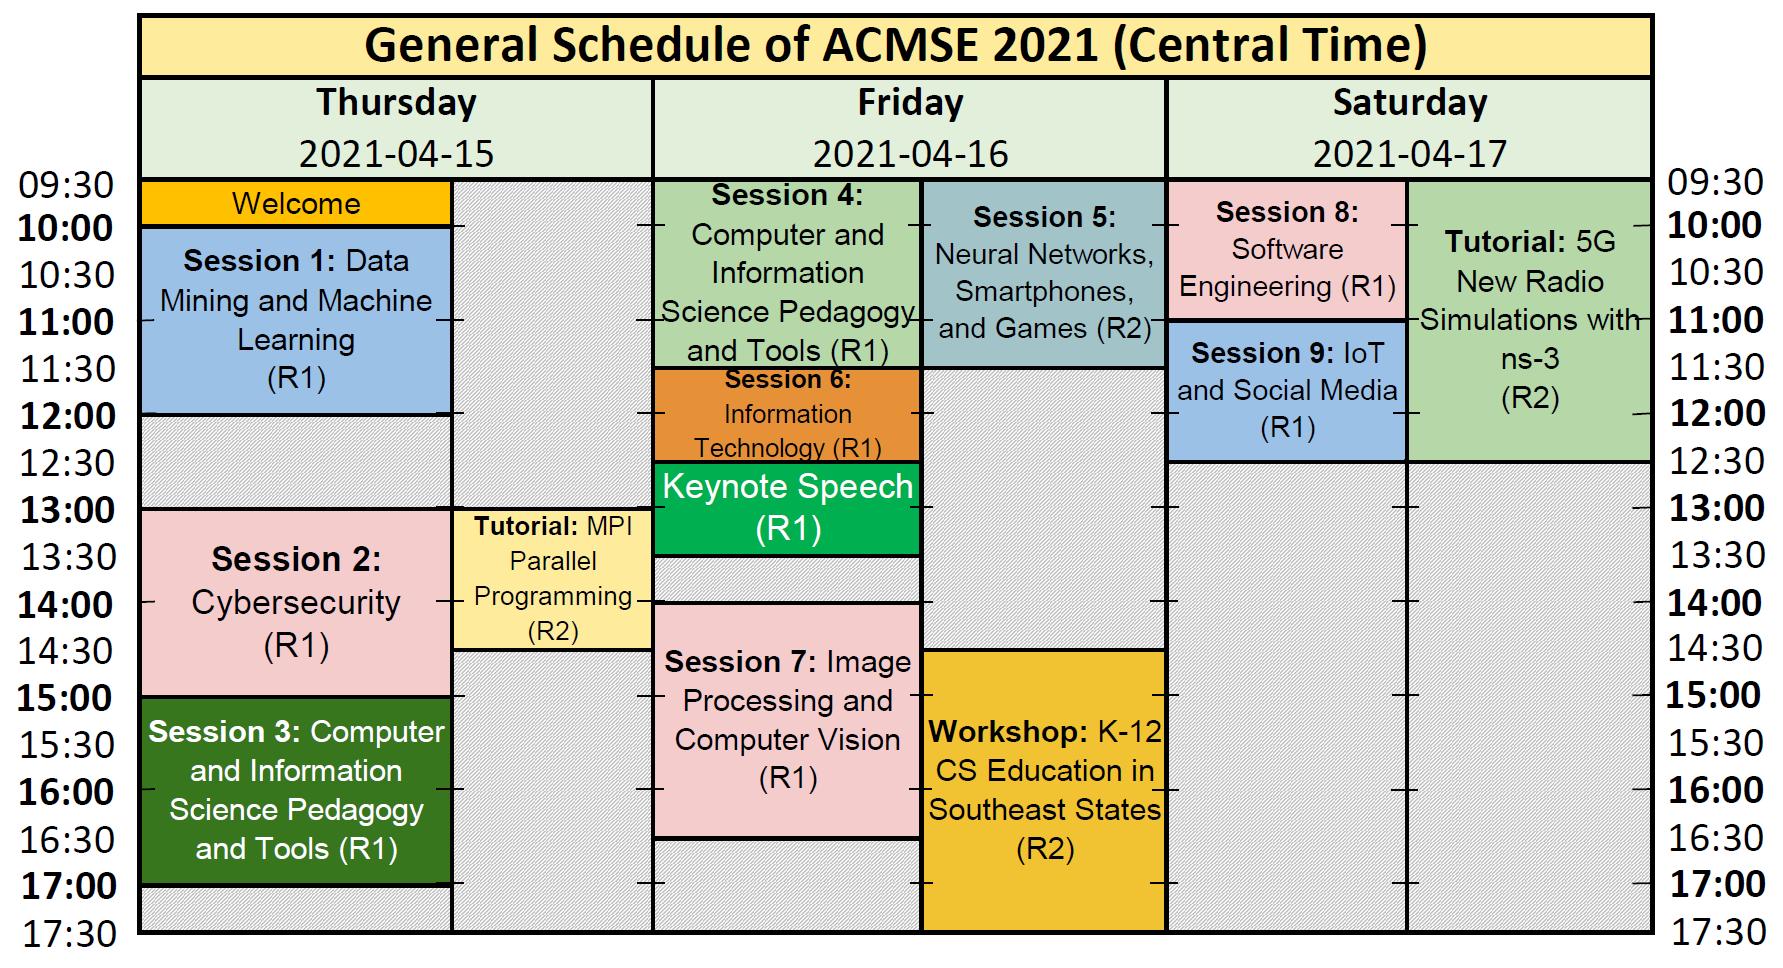 General Schedule